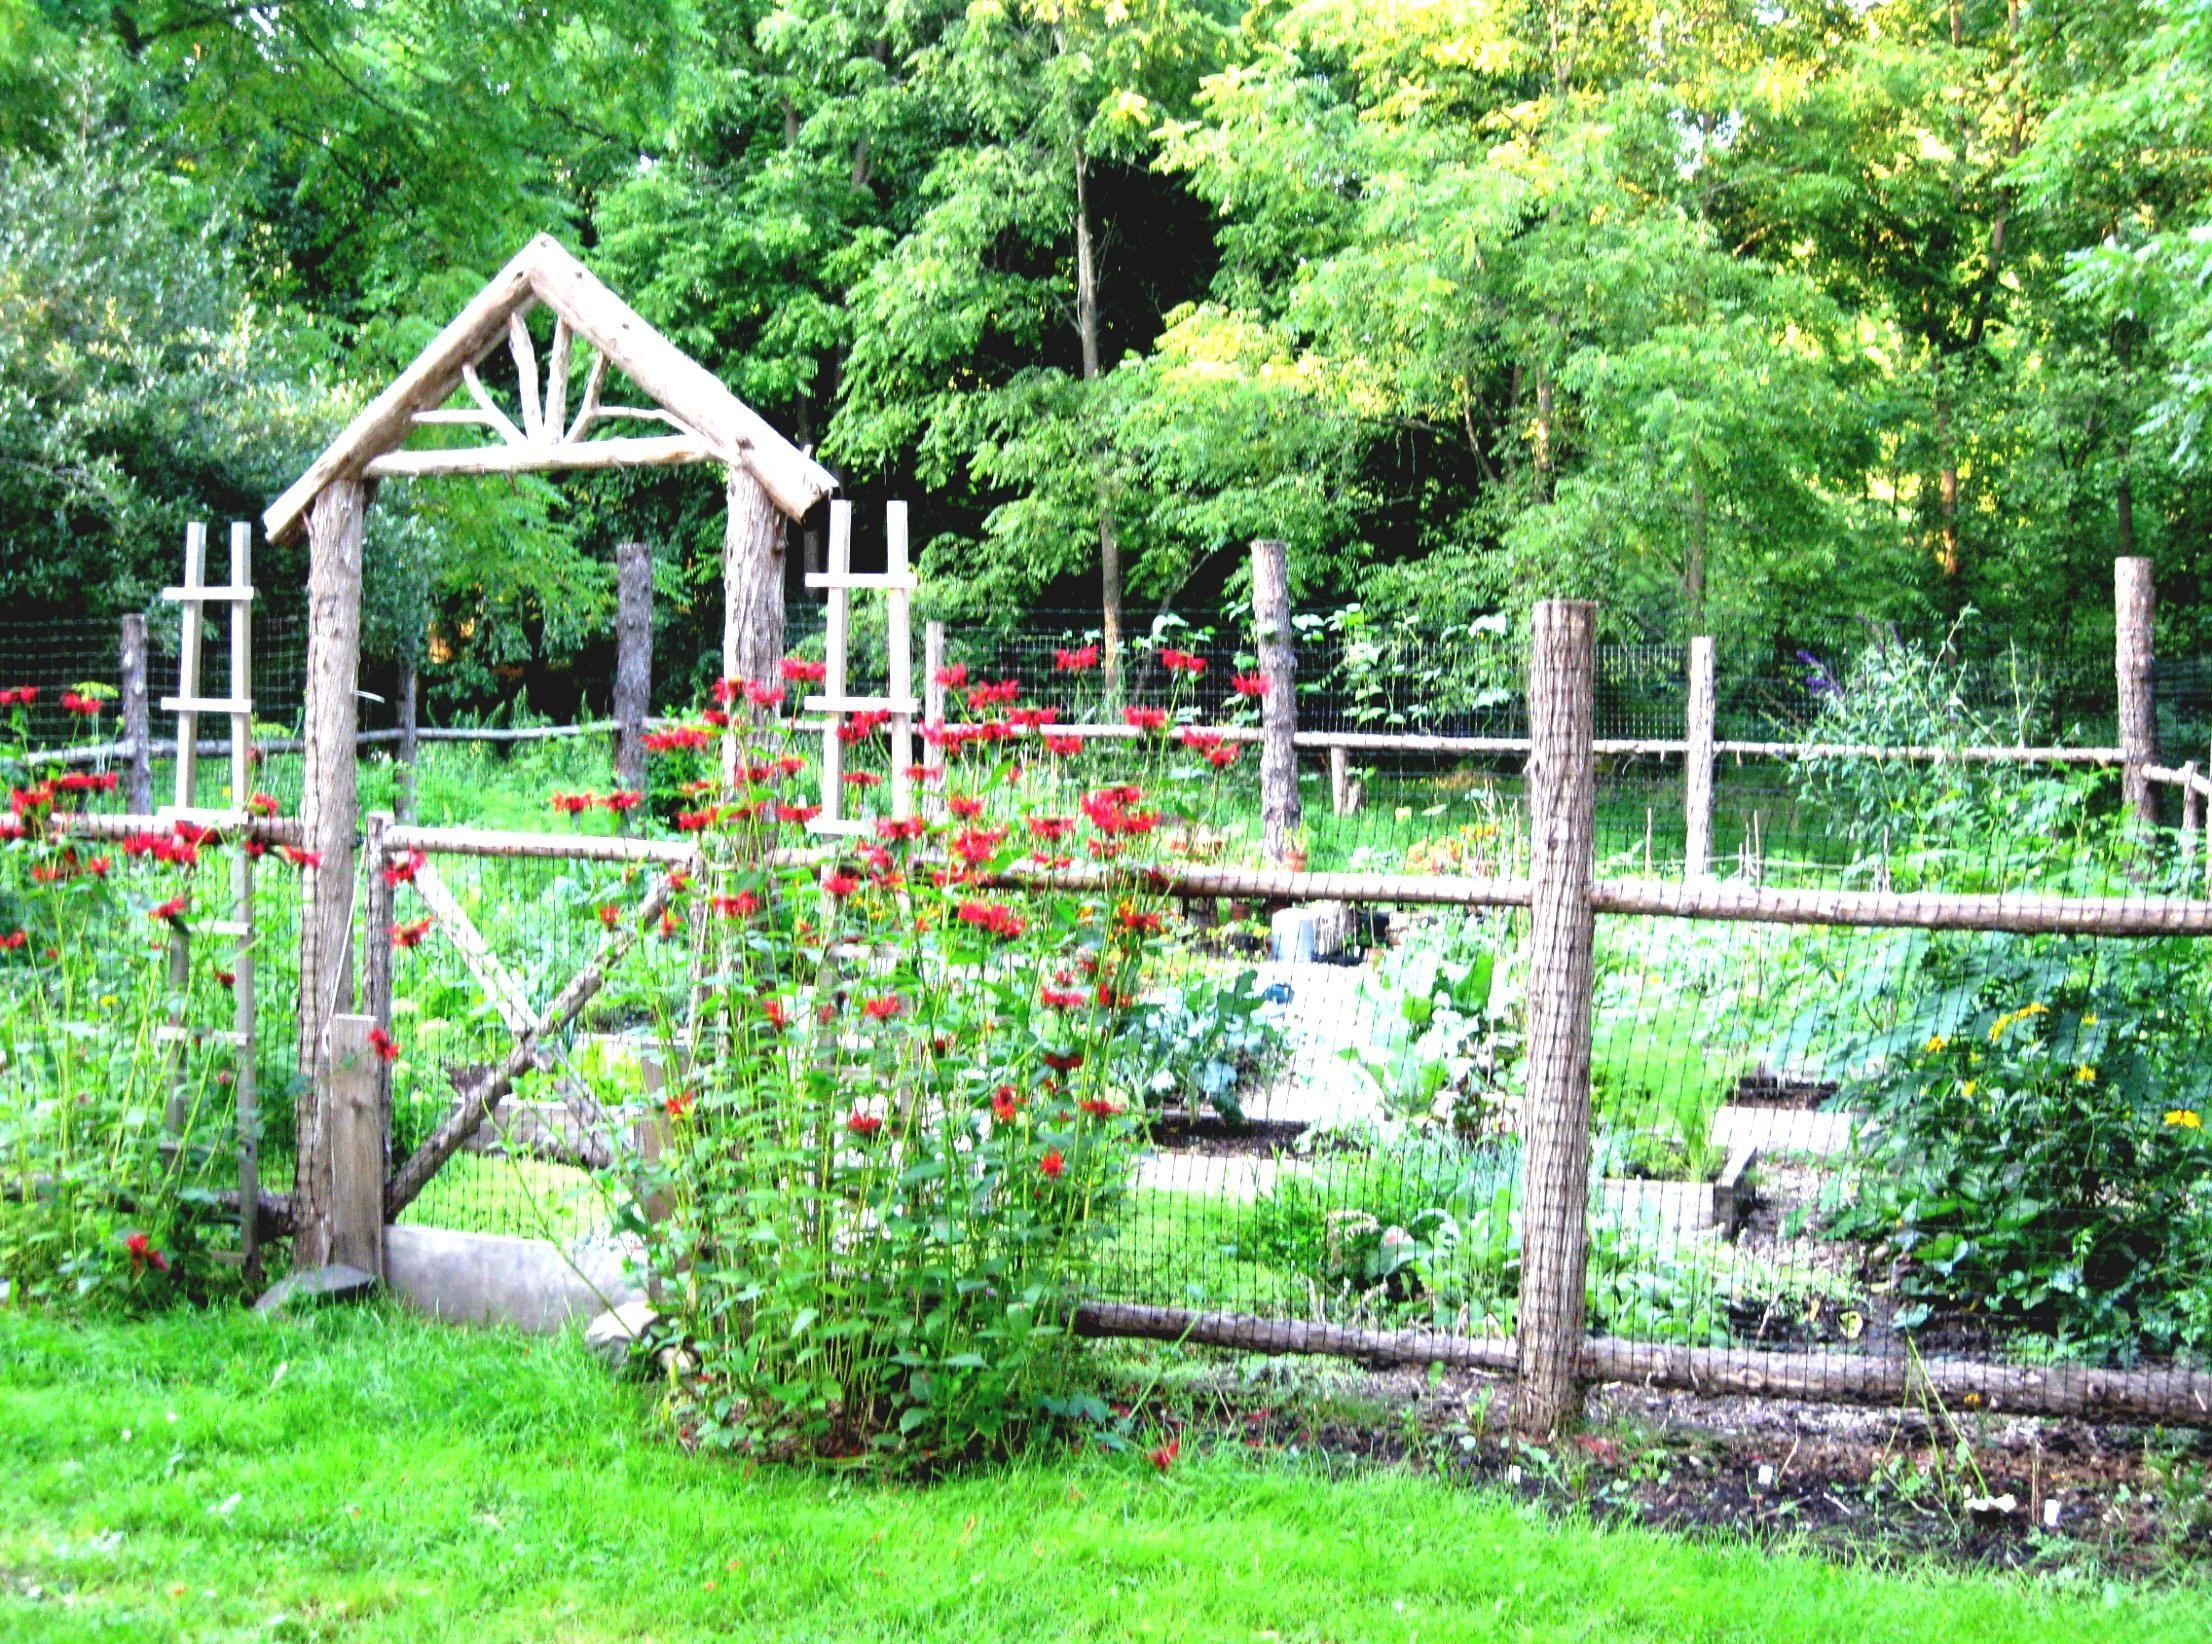 The 25 Best Ideas About Vegetable Garden Fences On Pinterest